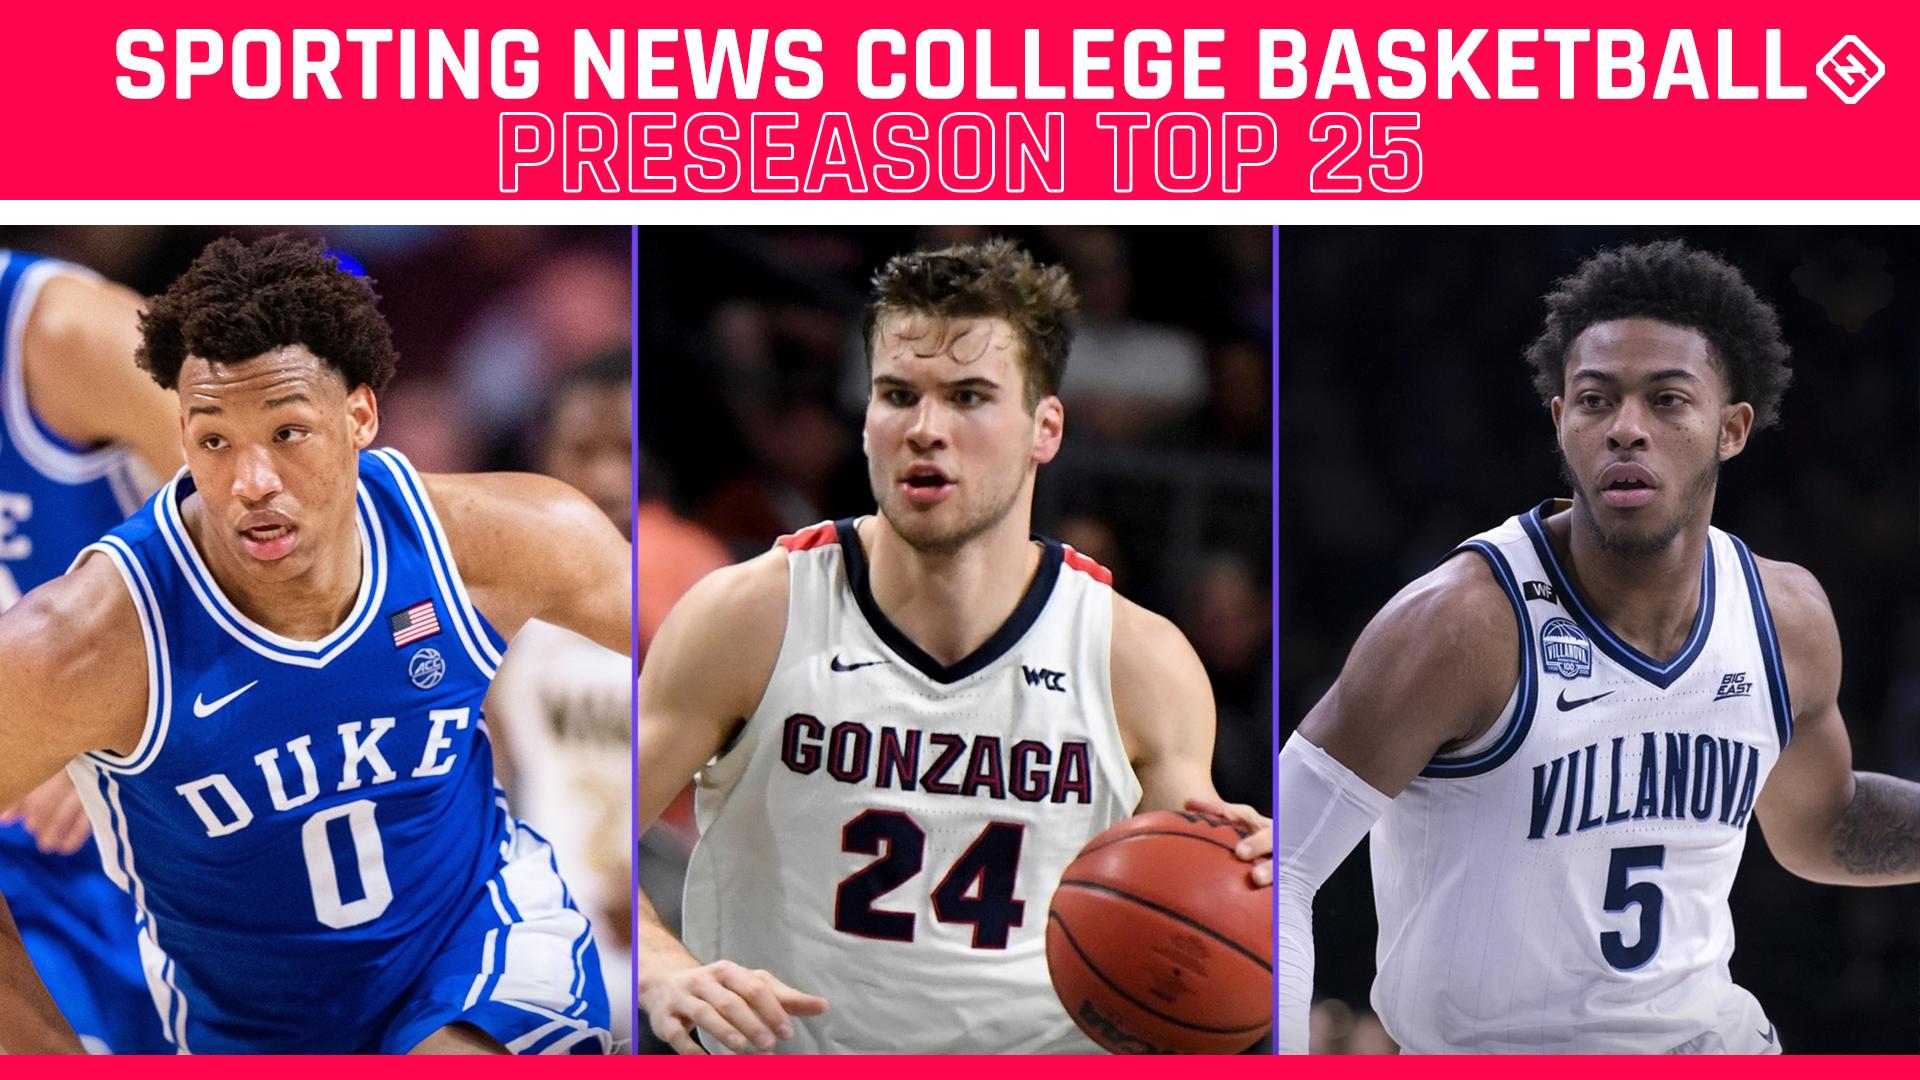 College basketball rankings: Sporting News' Preseason Top 25 for 2020-21 1